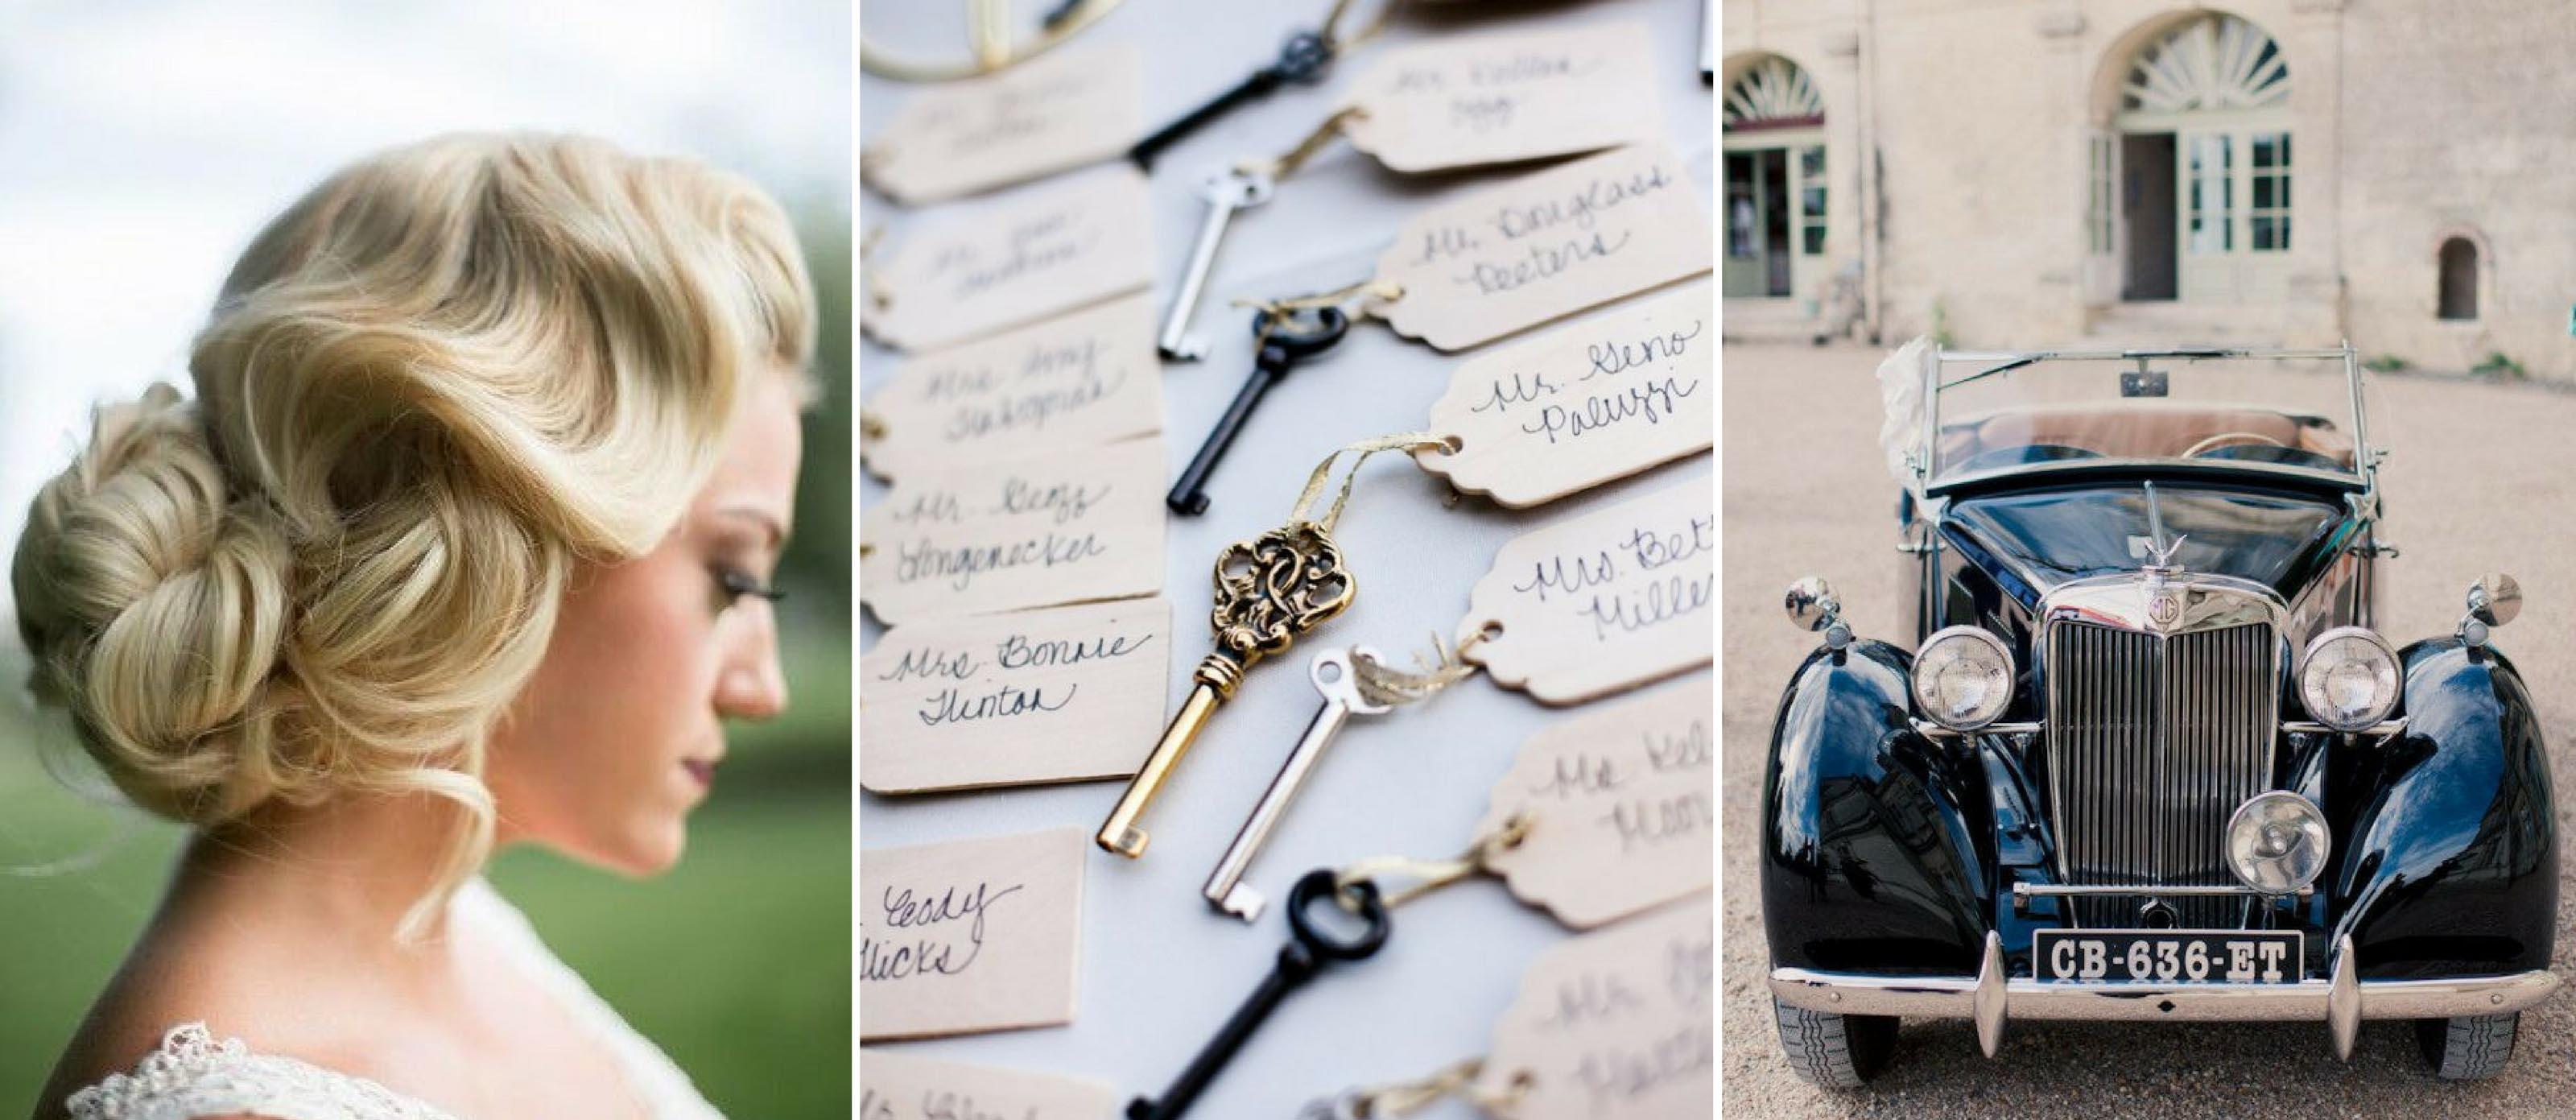 Vintage Wedding Ideas for Old Soul Brides | Fun365